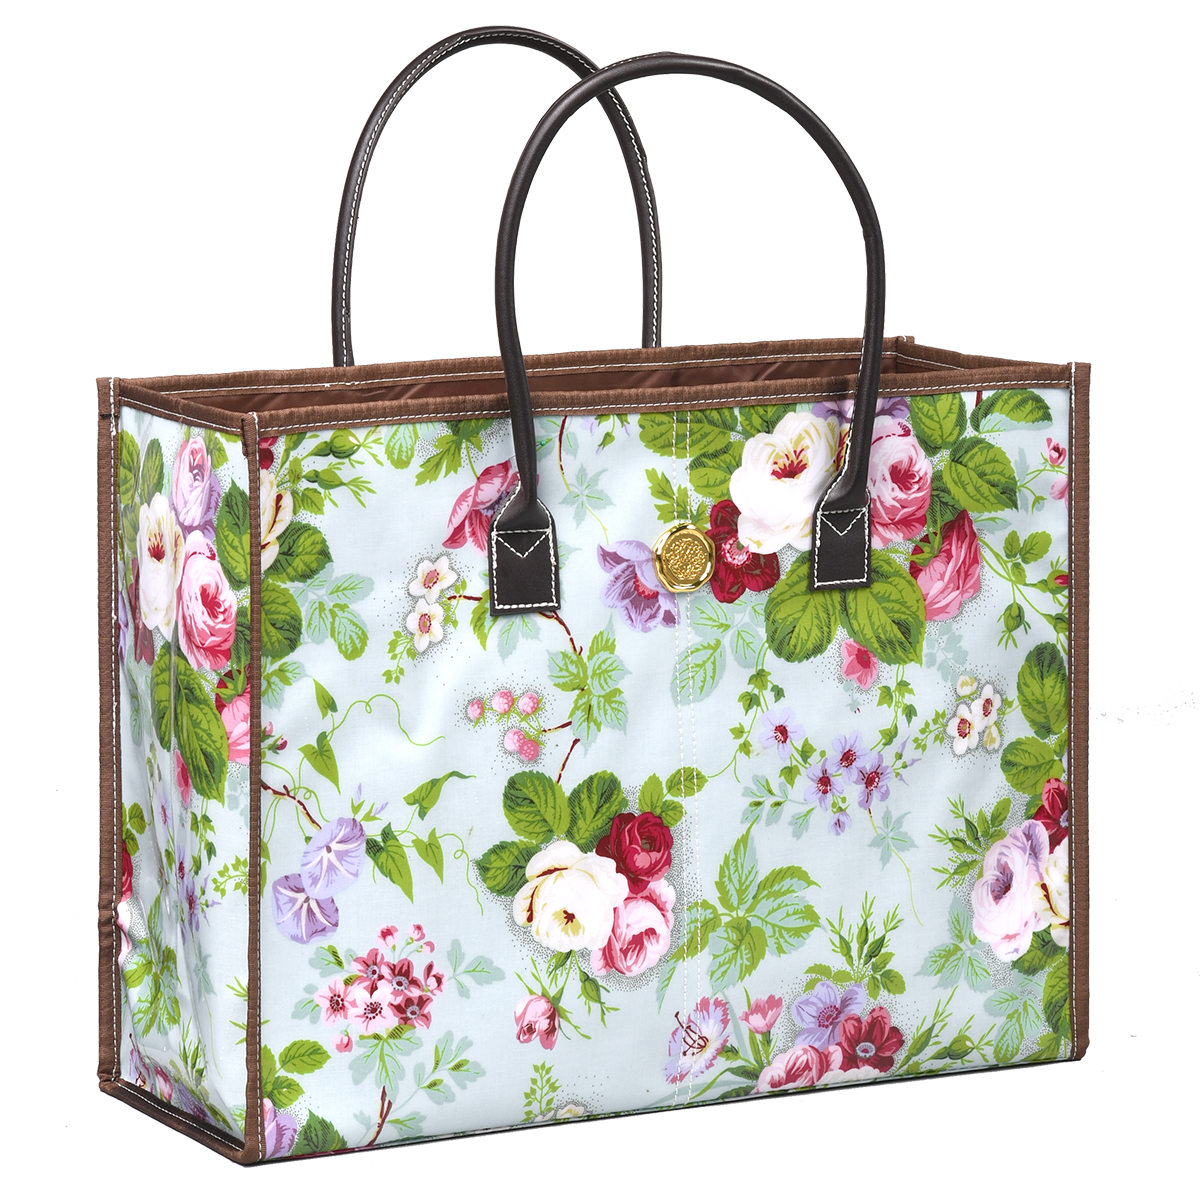 16 X 12 Custom Printed Kraft Paper Wedding Gift Bags: Amelie Floral All Purpose Tote Bag